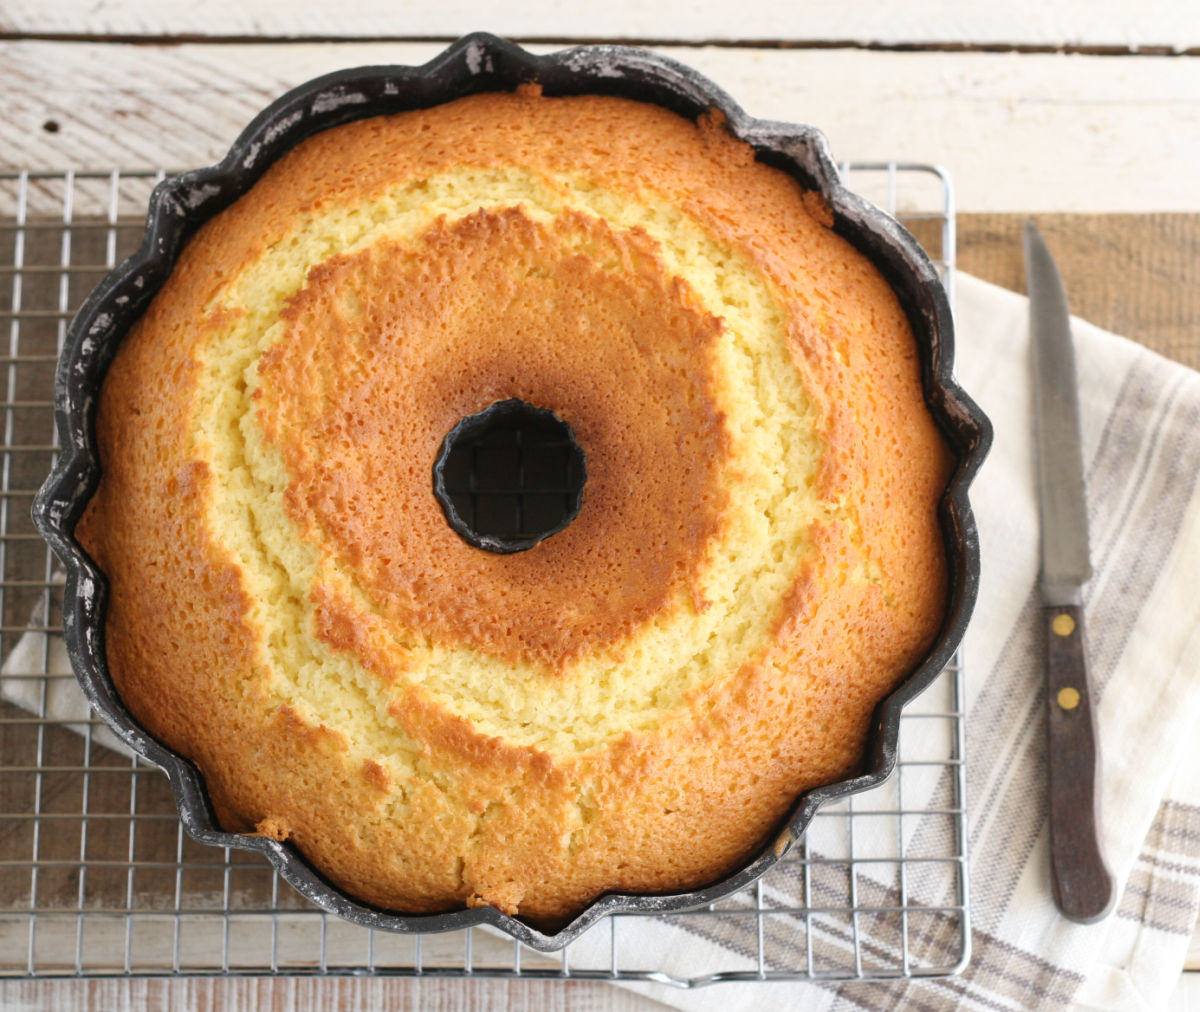 lemon cake in Bundt pan, cooling on baking rack.